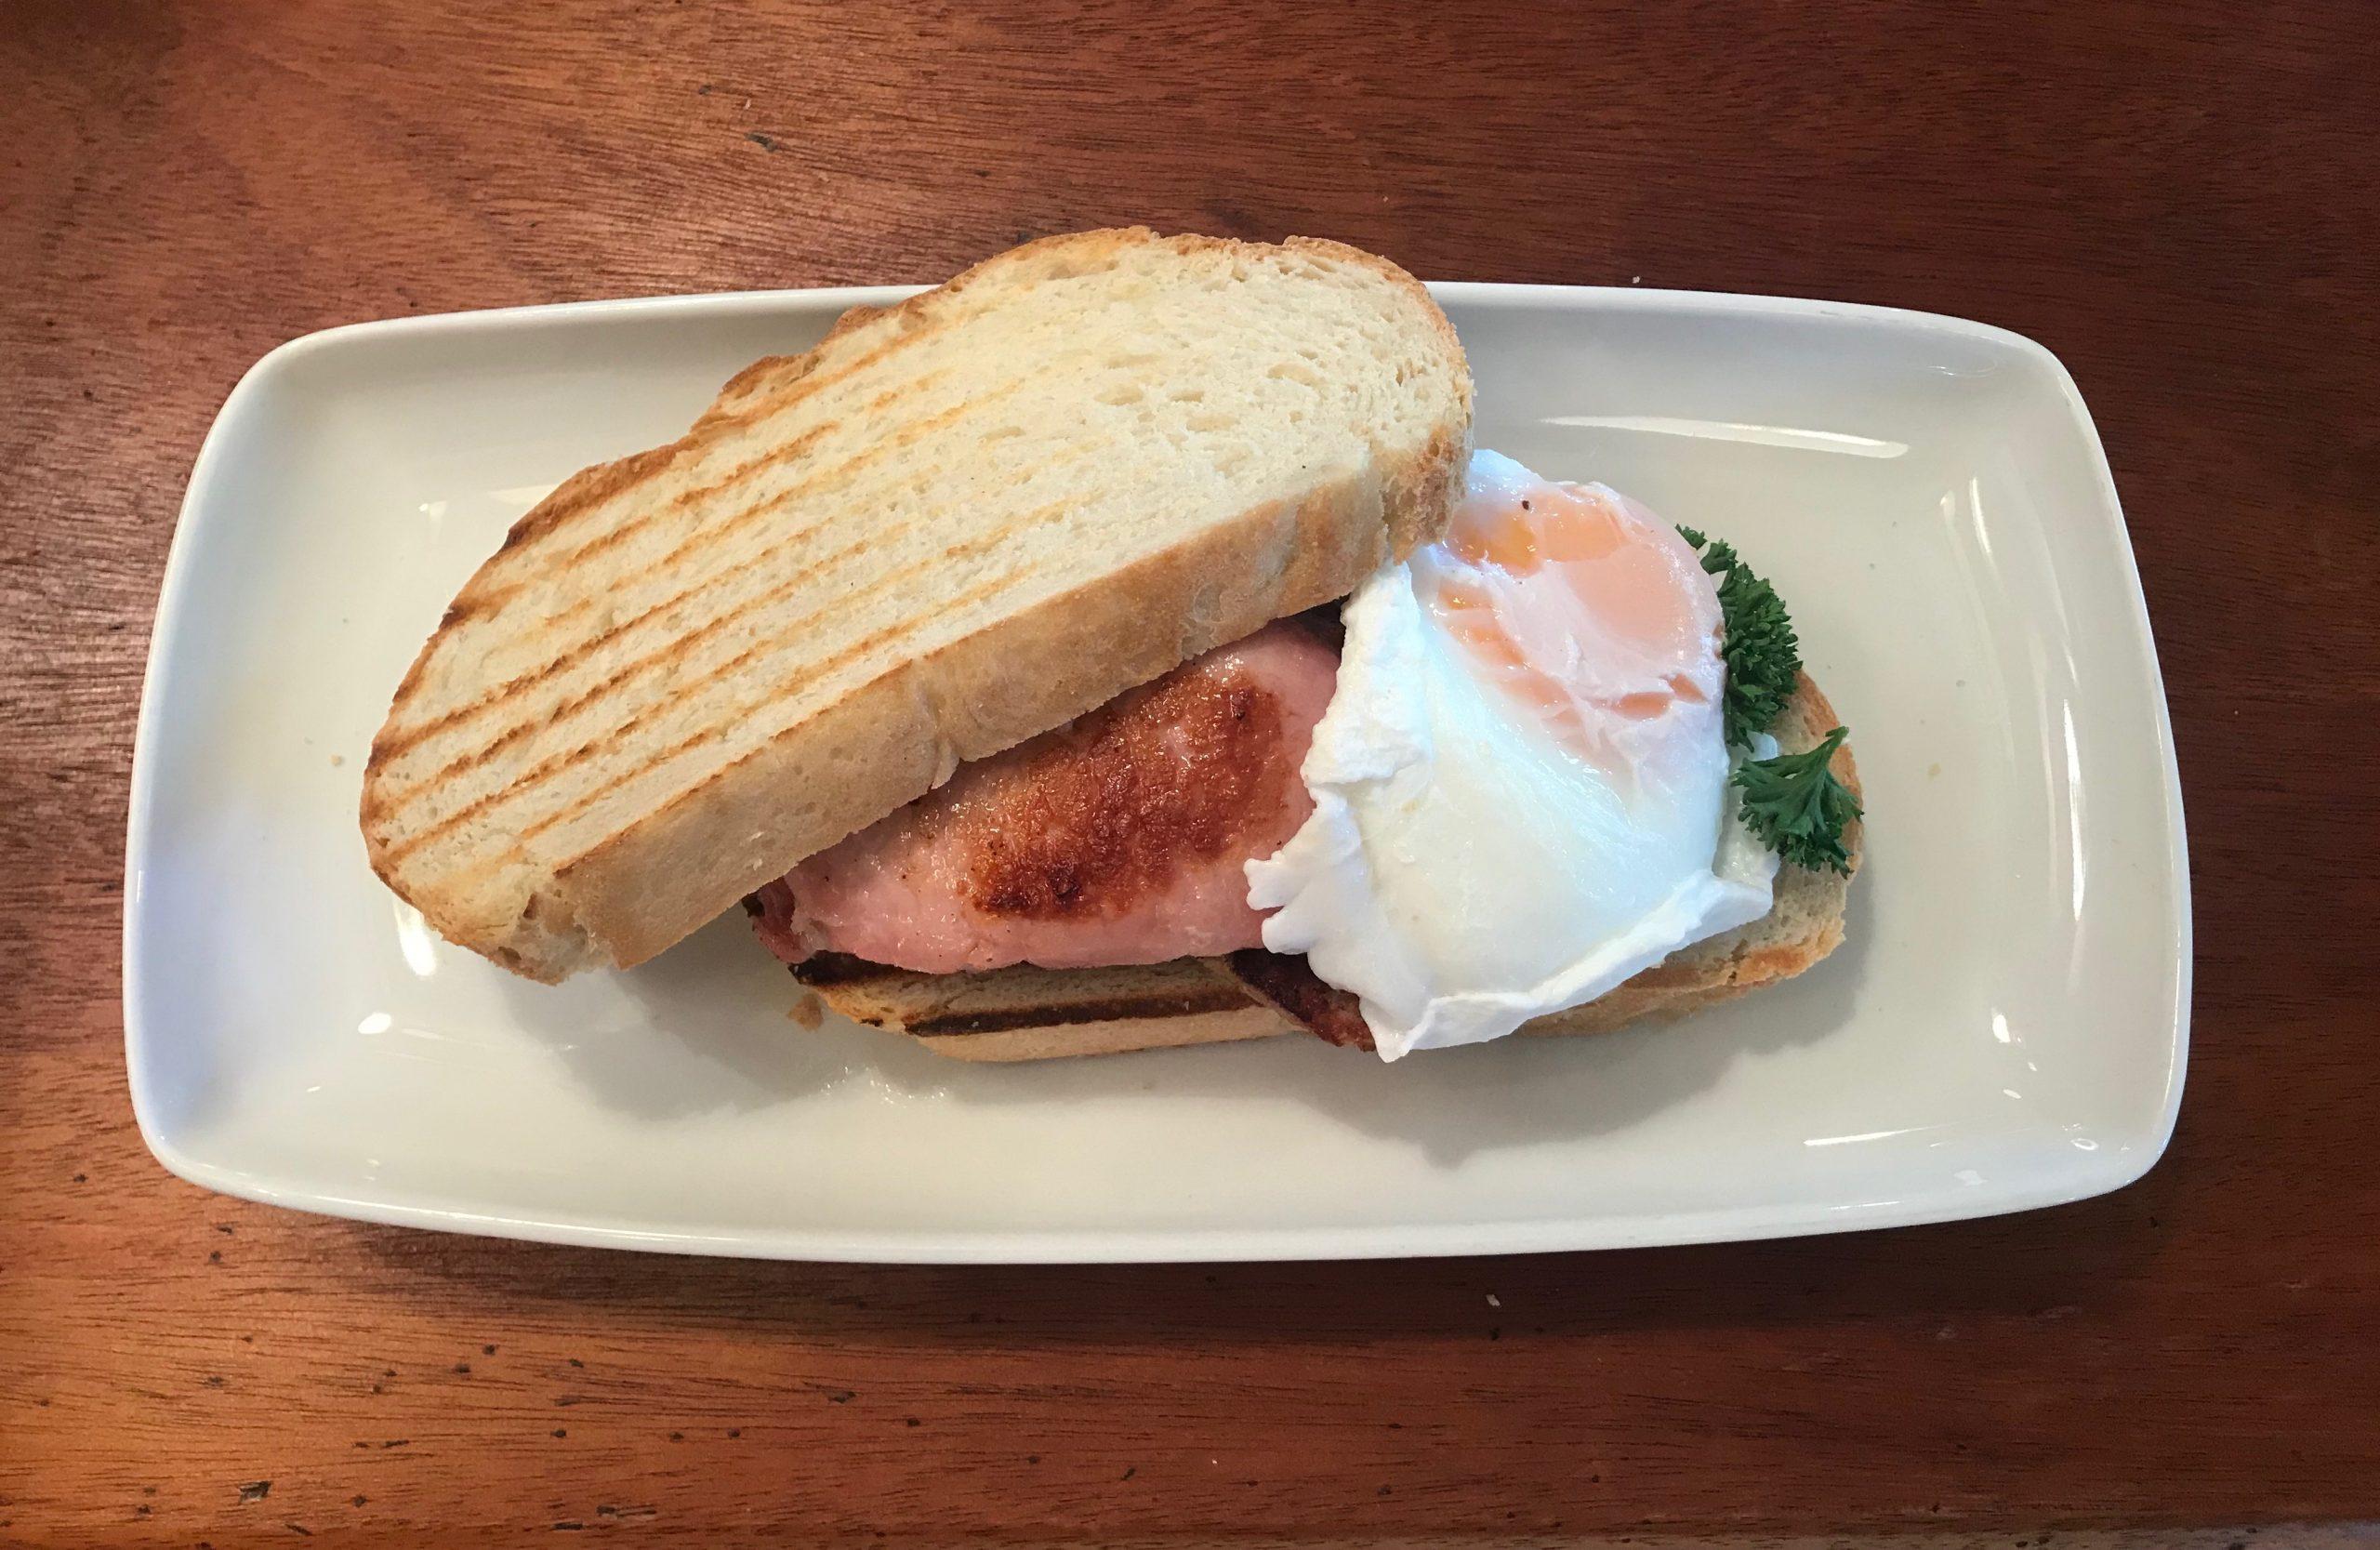 Breakfast at Daffies